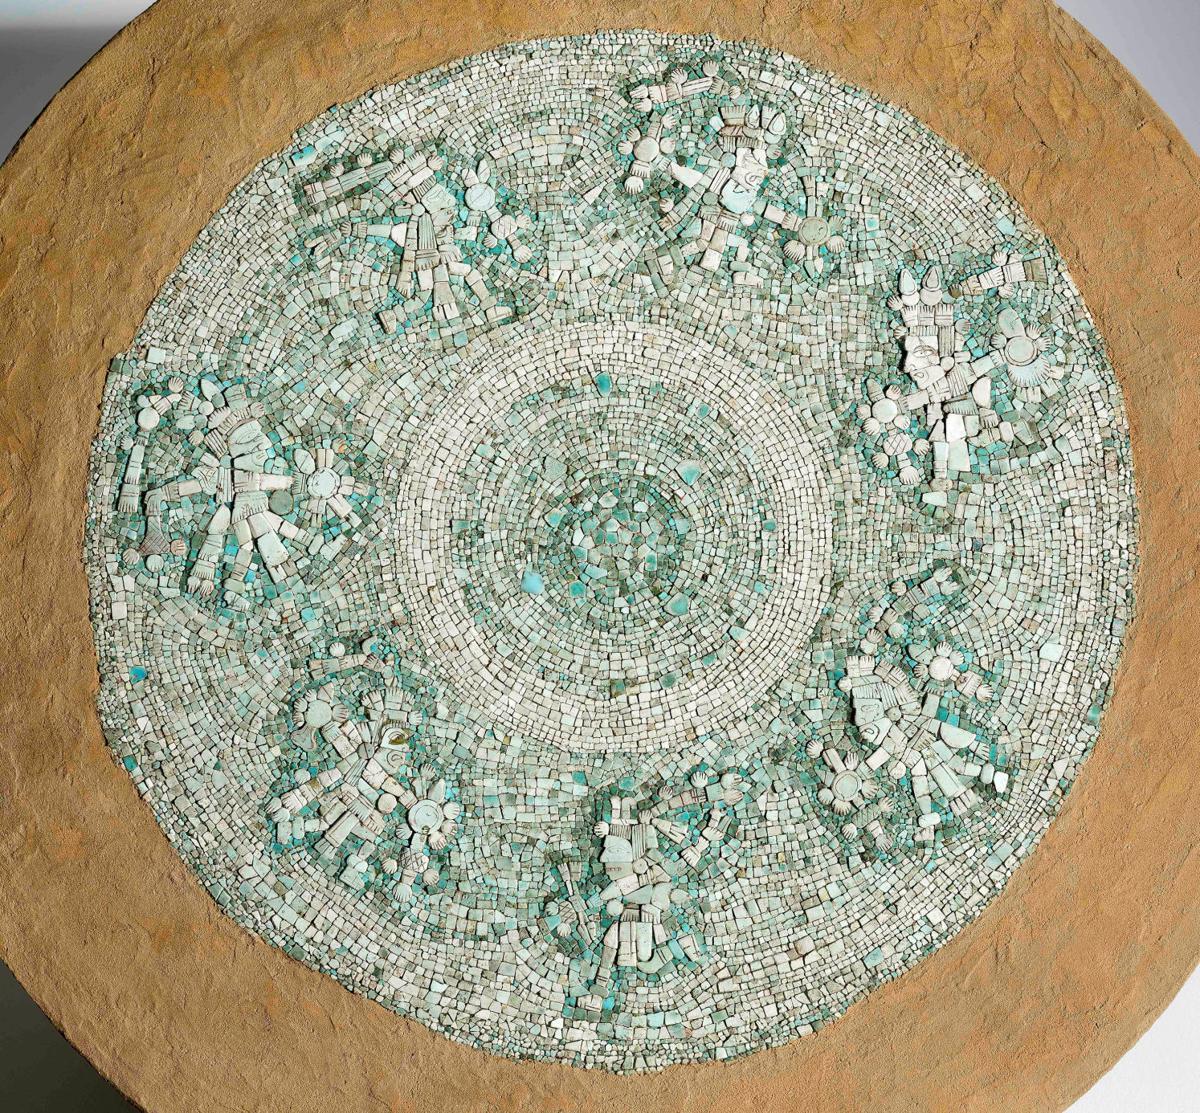 Turquoise mosaic tiles